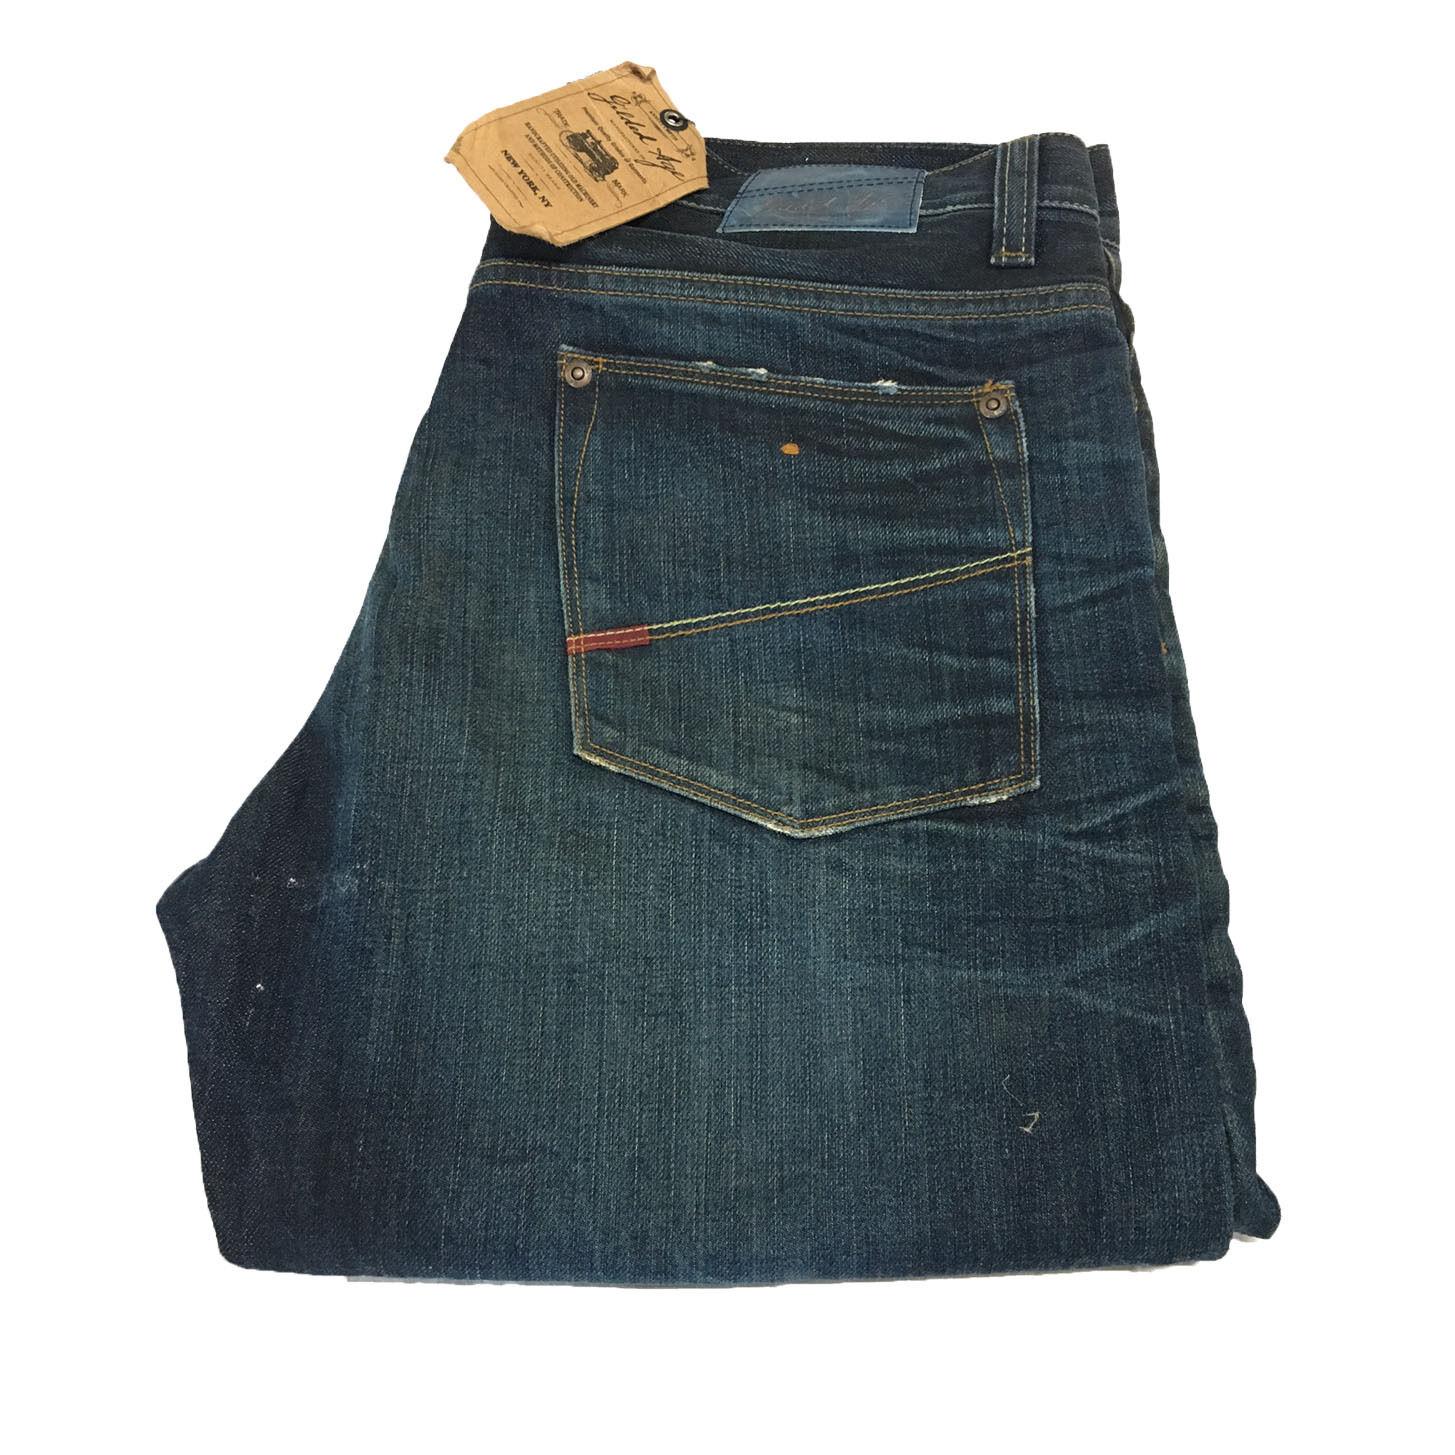 GILDED AGE jeans uomo modello GA-1011-NS-HO 100% cotone MADE IN ITALY